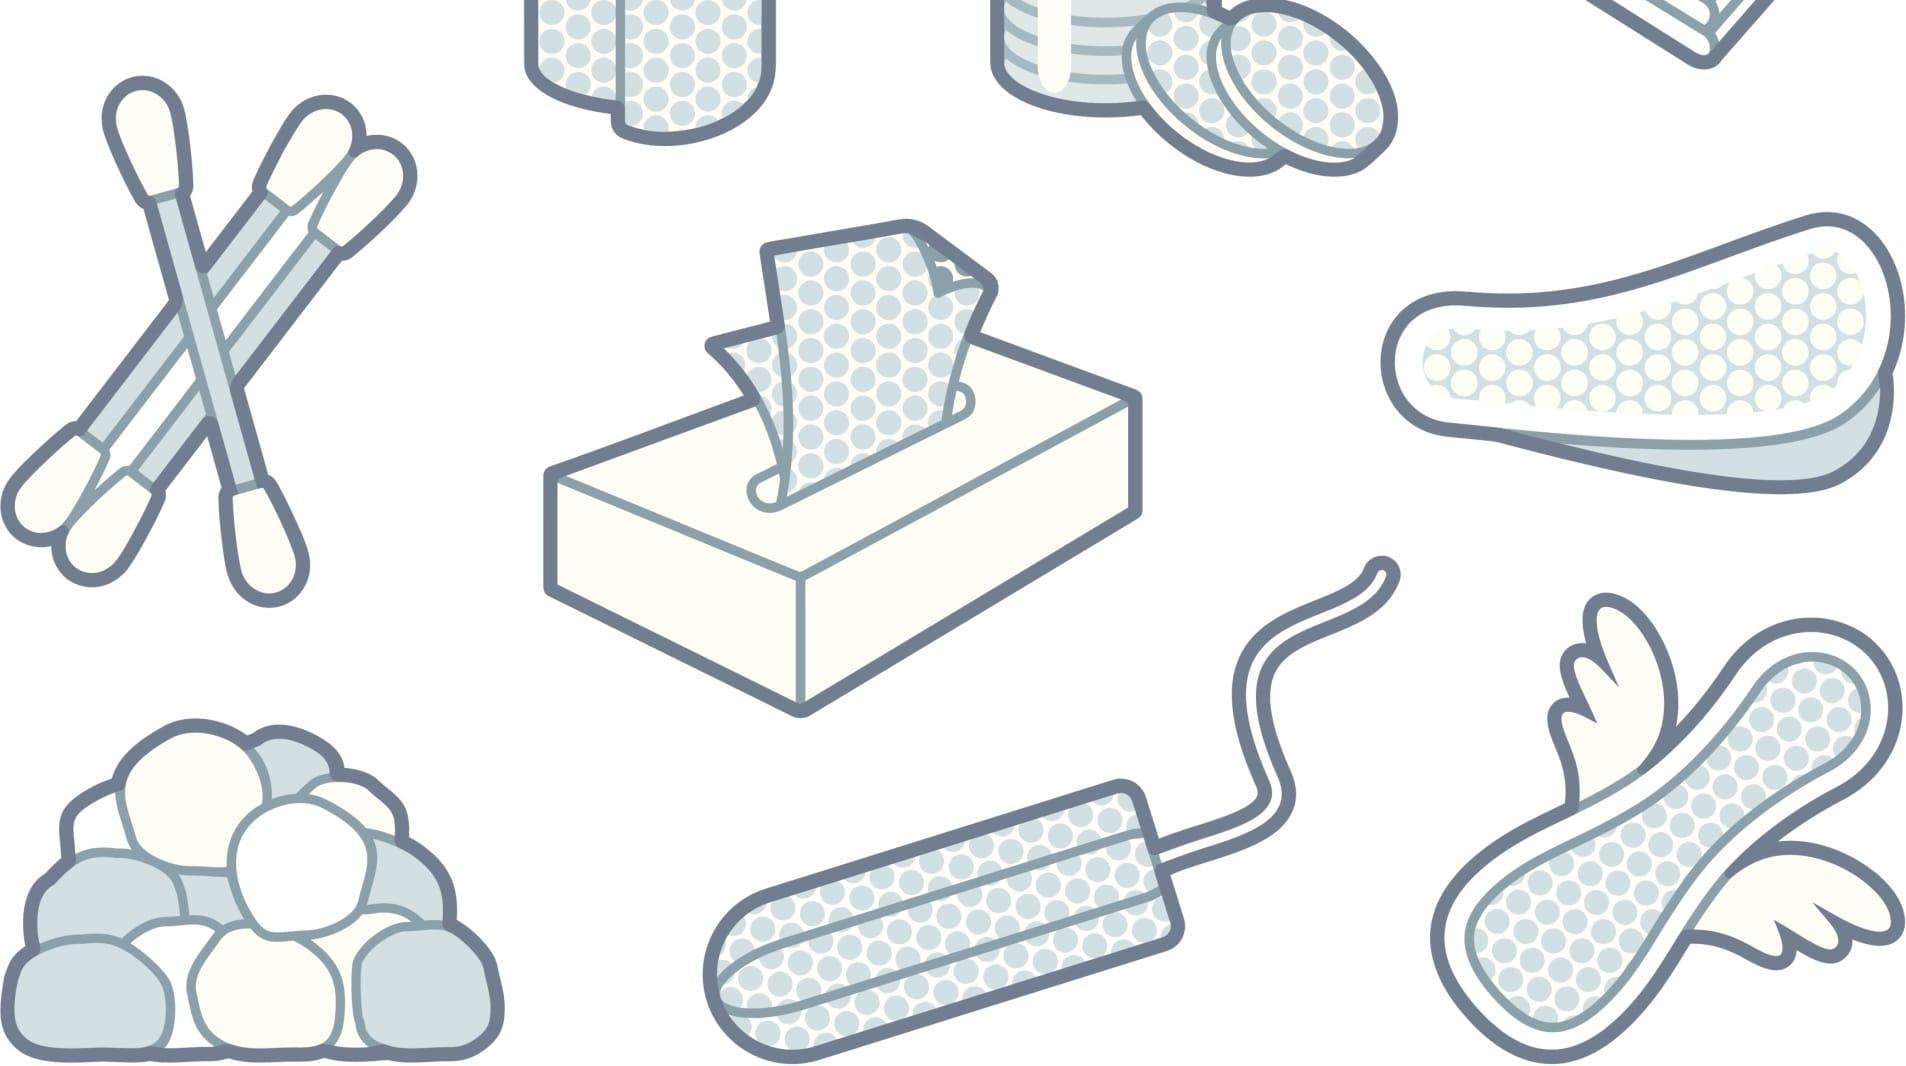 Assorbenti biodegradabili: dove comprarli online